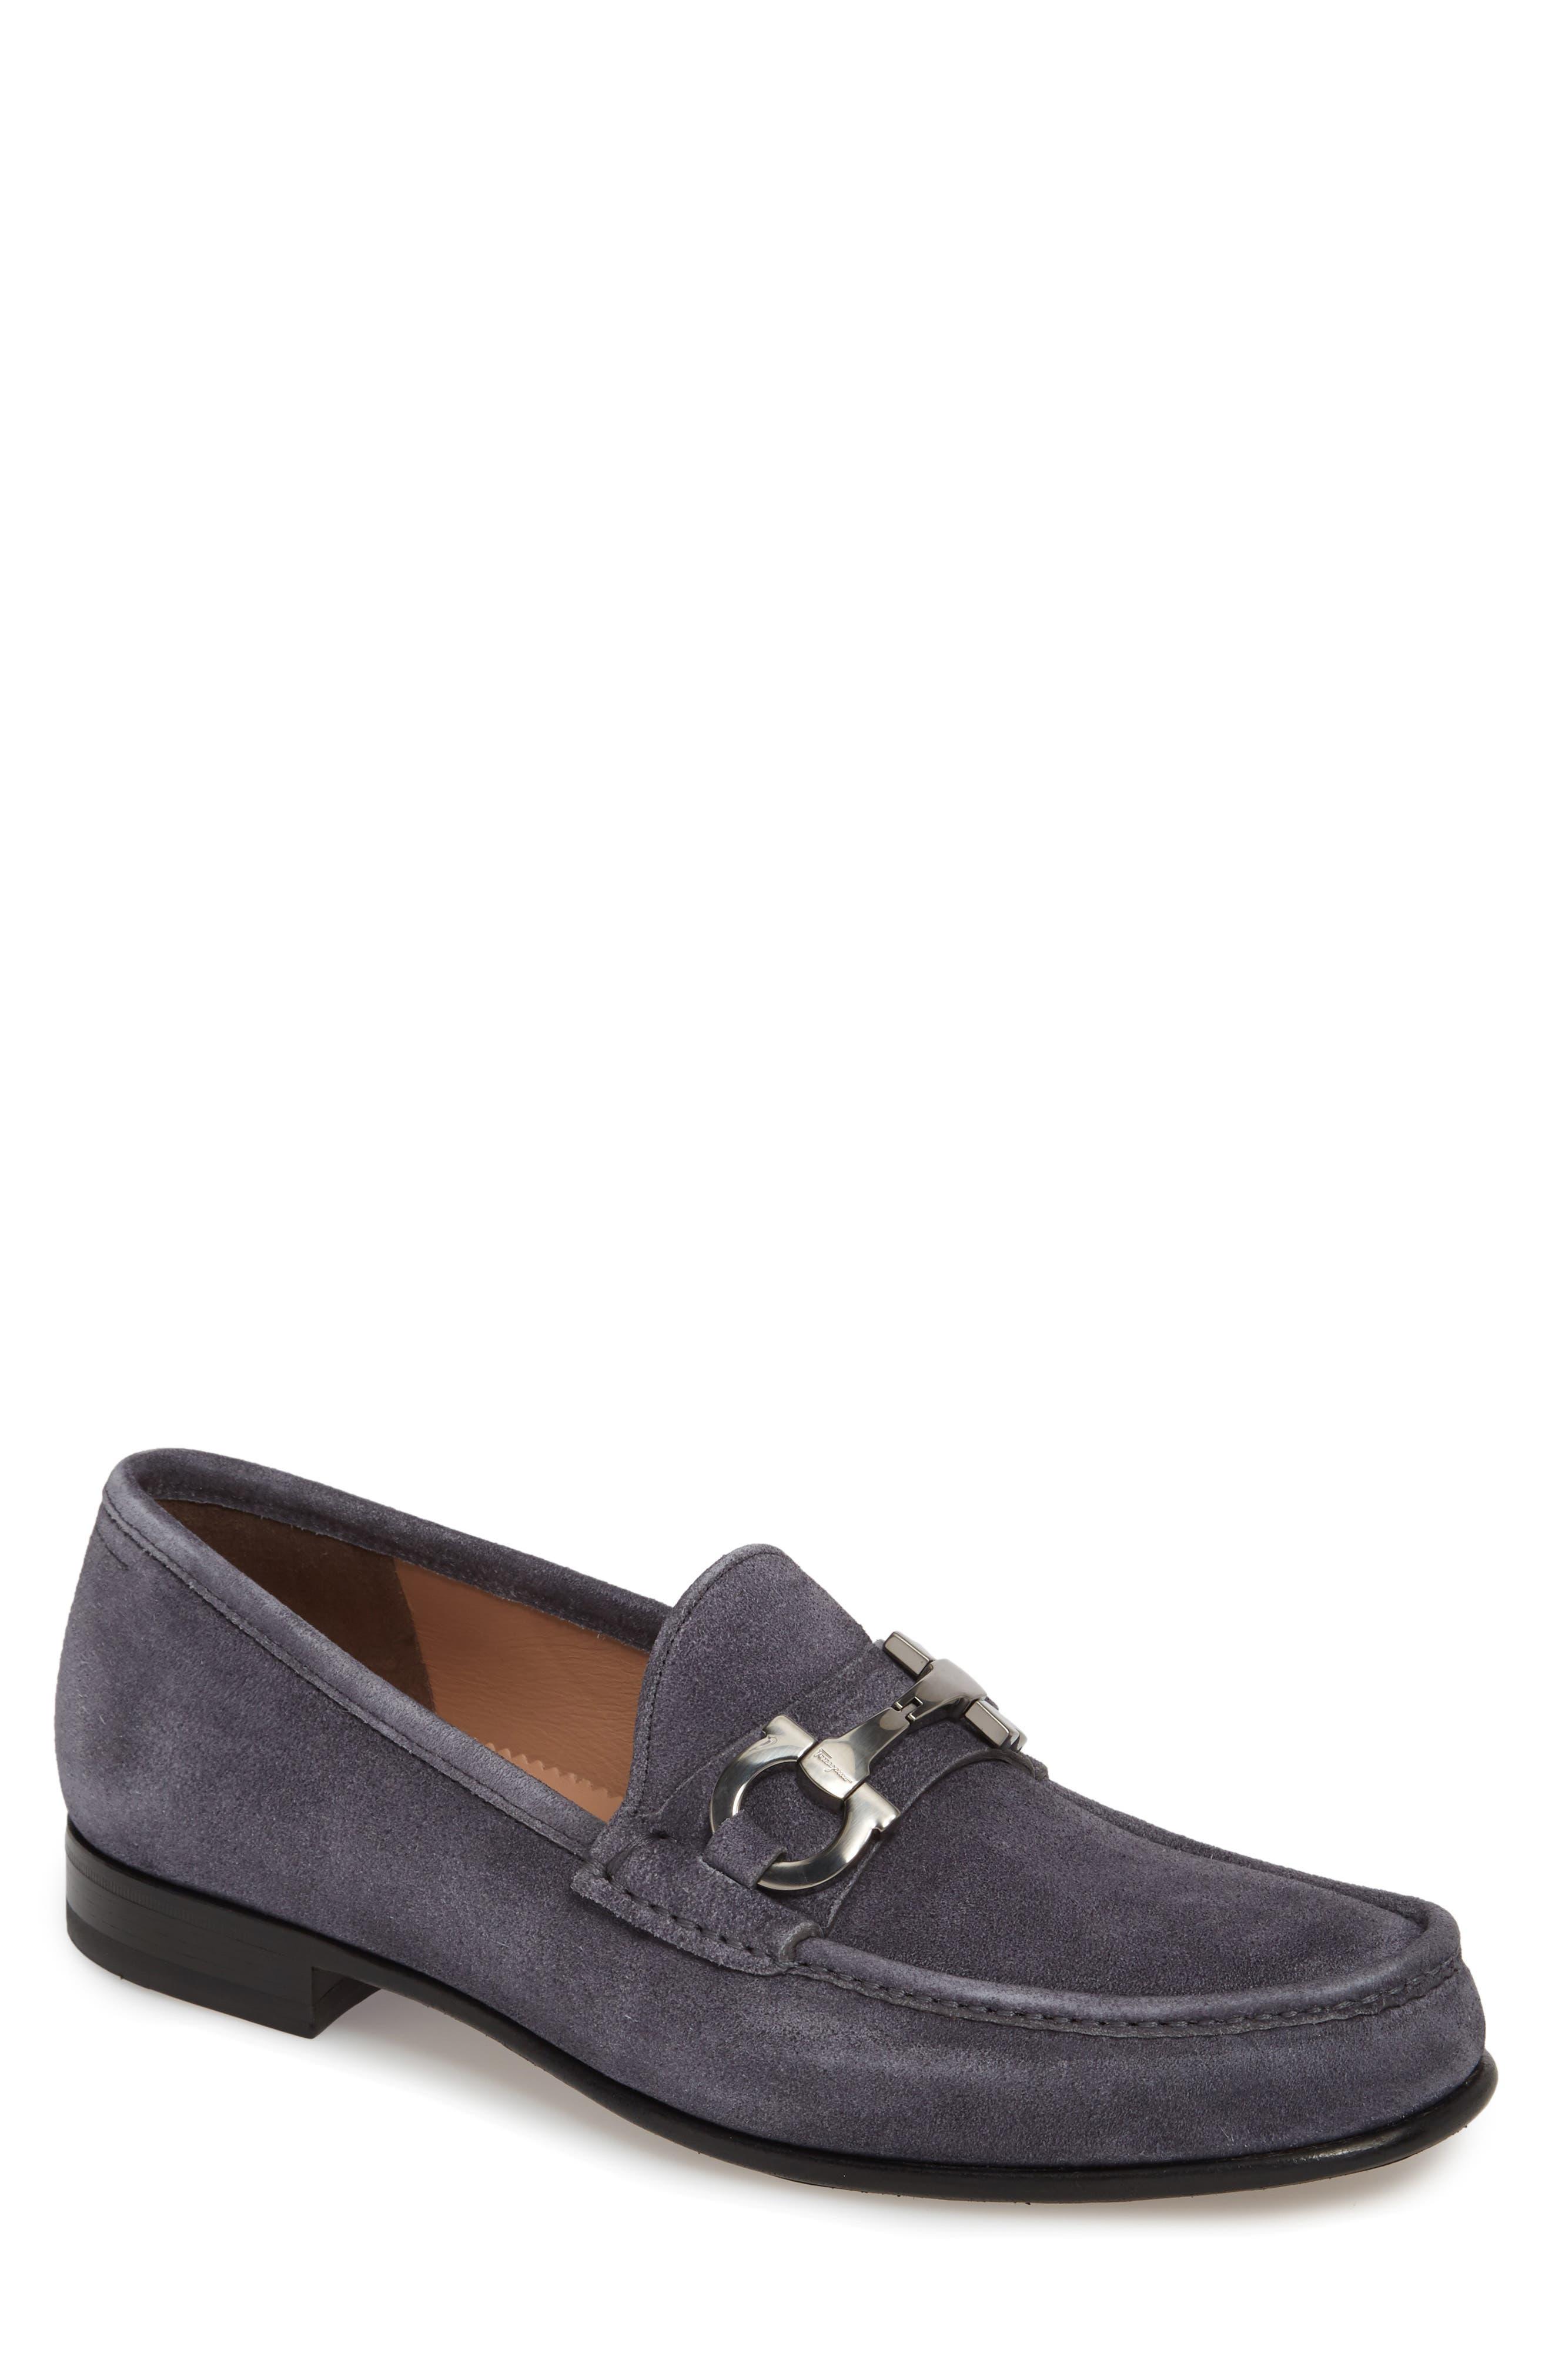 Men's VALENTINO Garavani Black Leather Slip On Loafers Dress Shoes Sz EUR 42 US